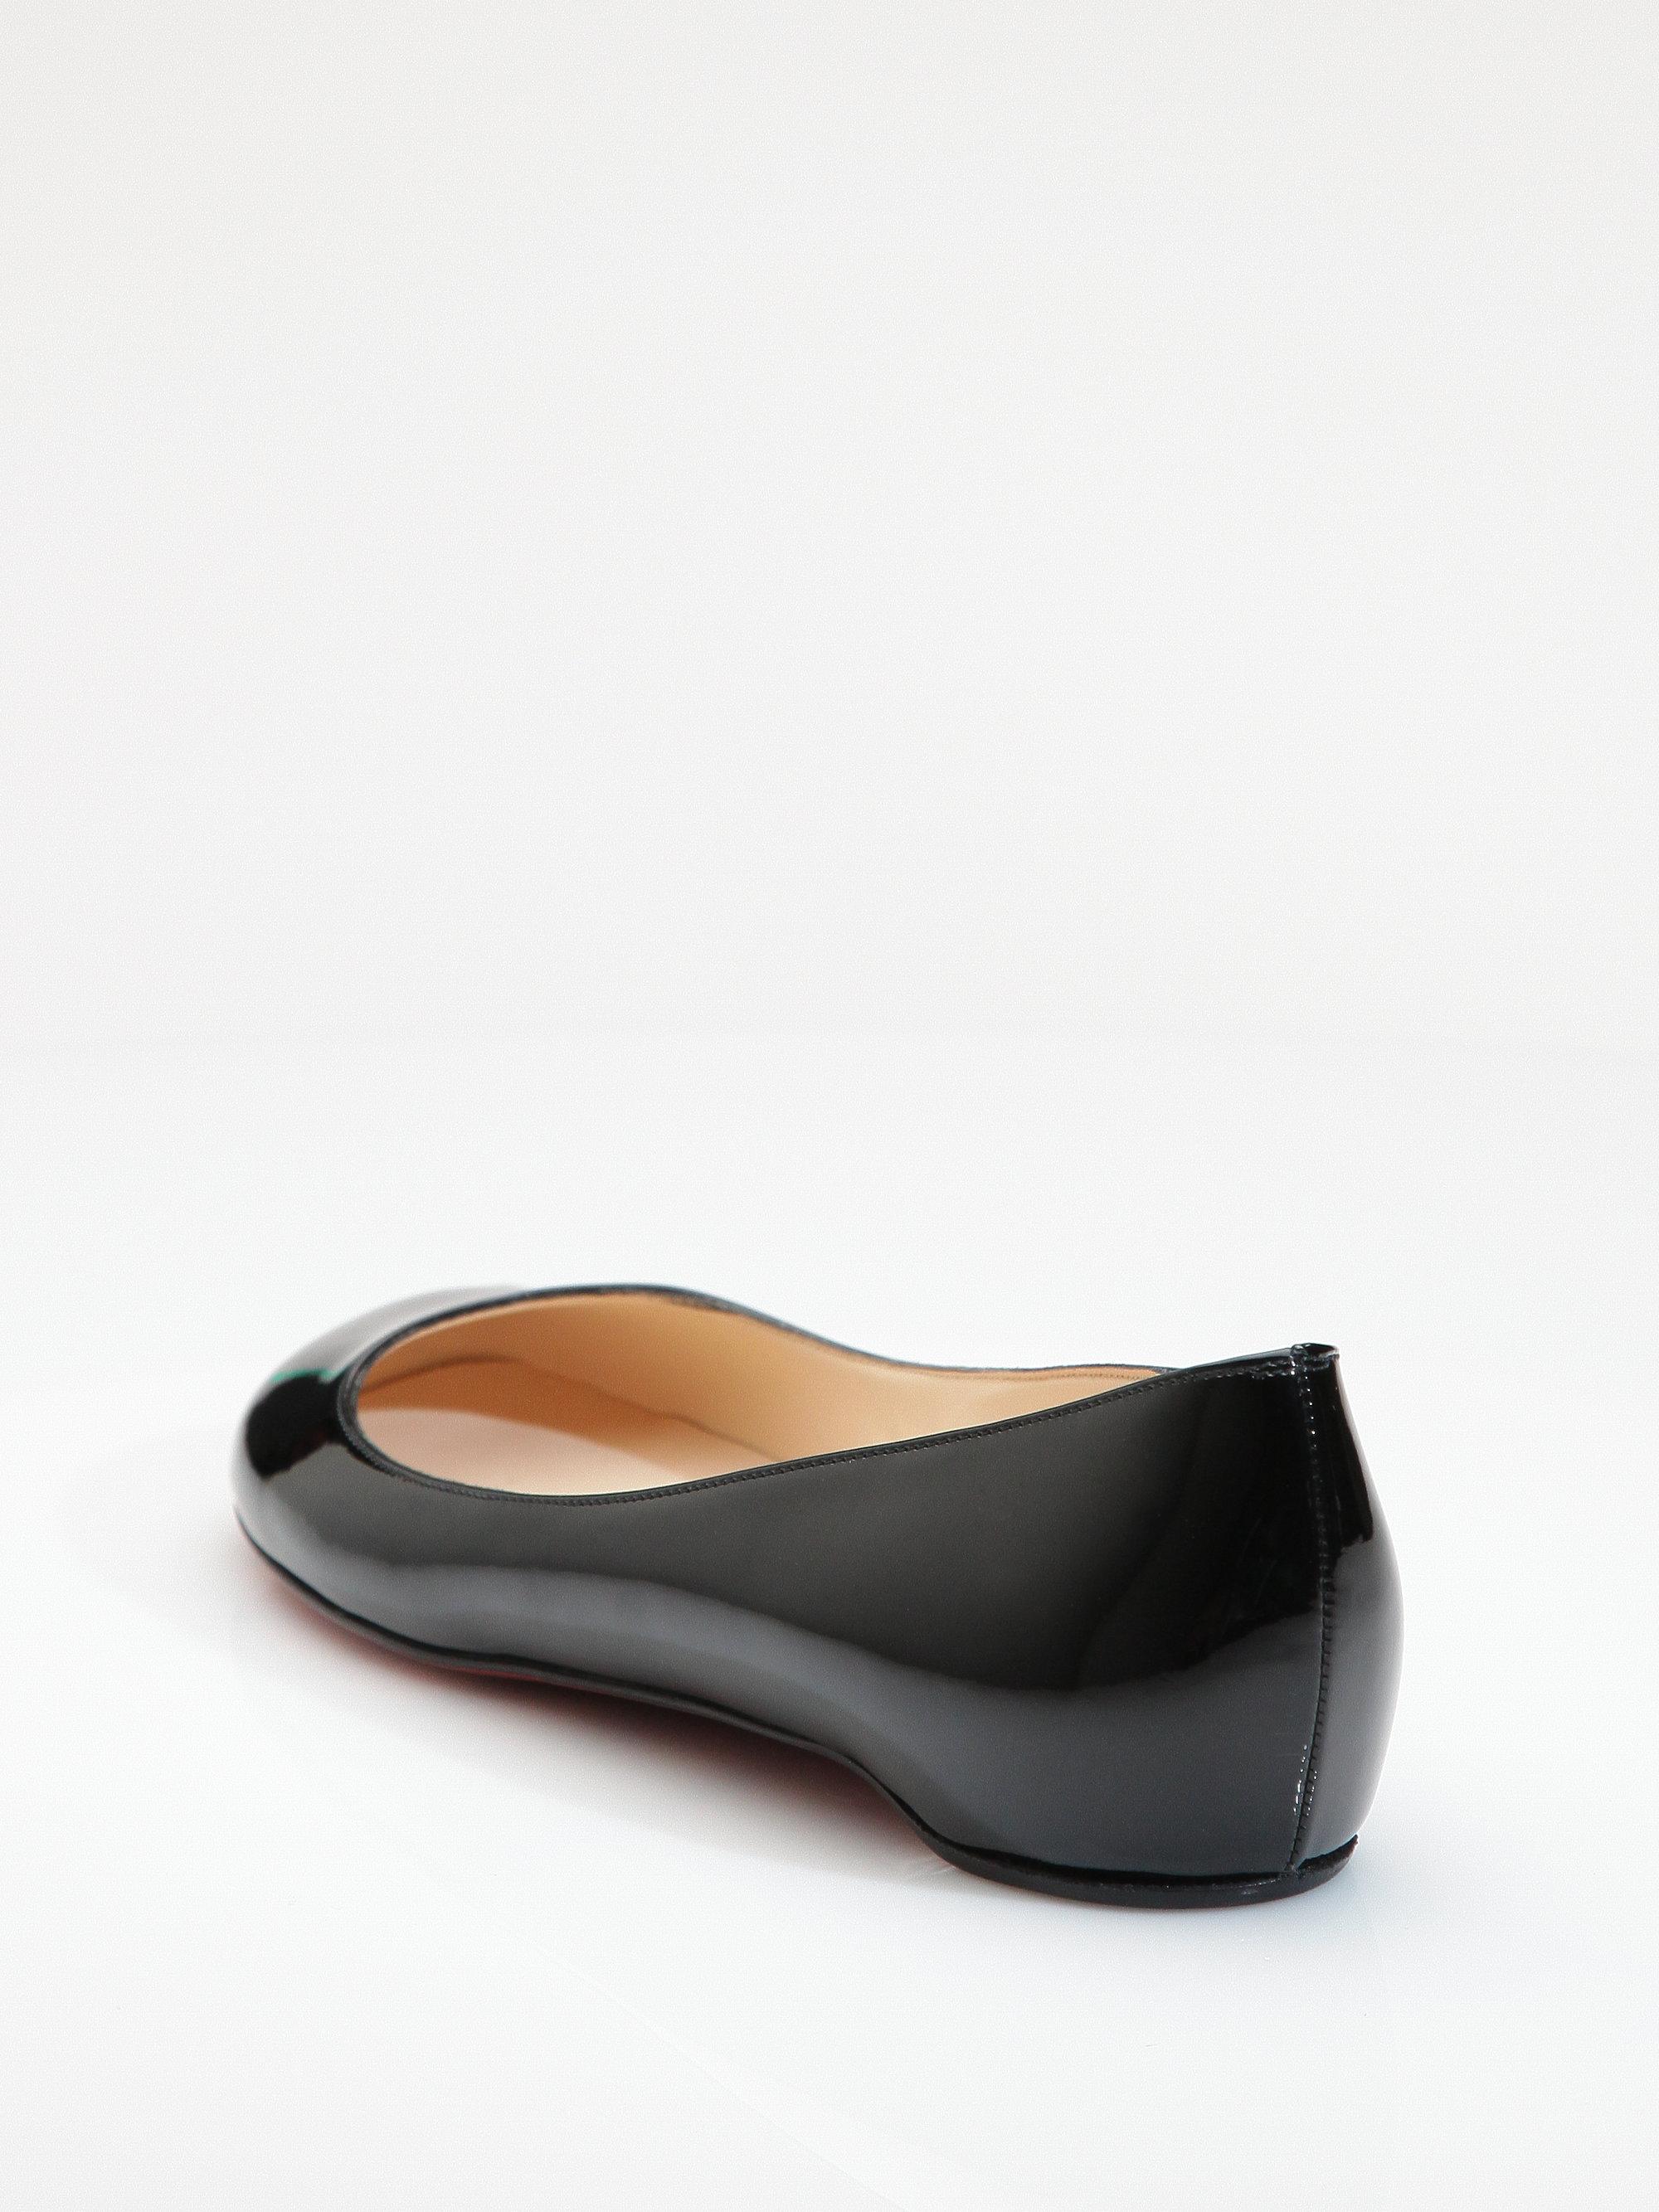 98758aaea10e ... sale lyst christian louboutin kobe patent leather flats in black d5a8a  585ef